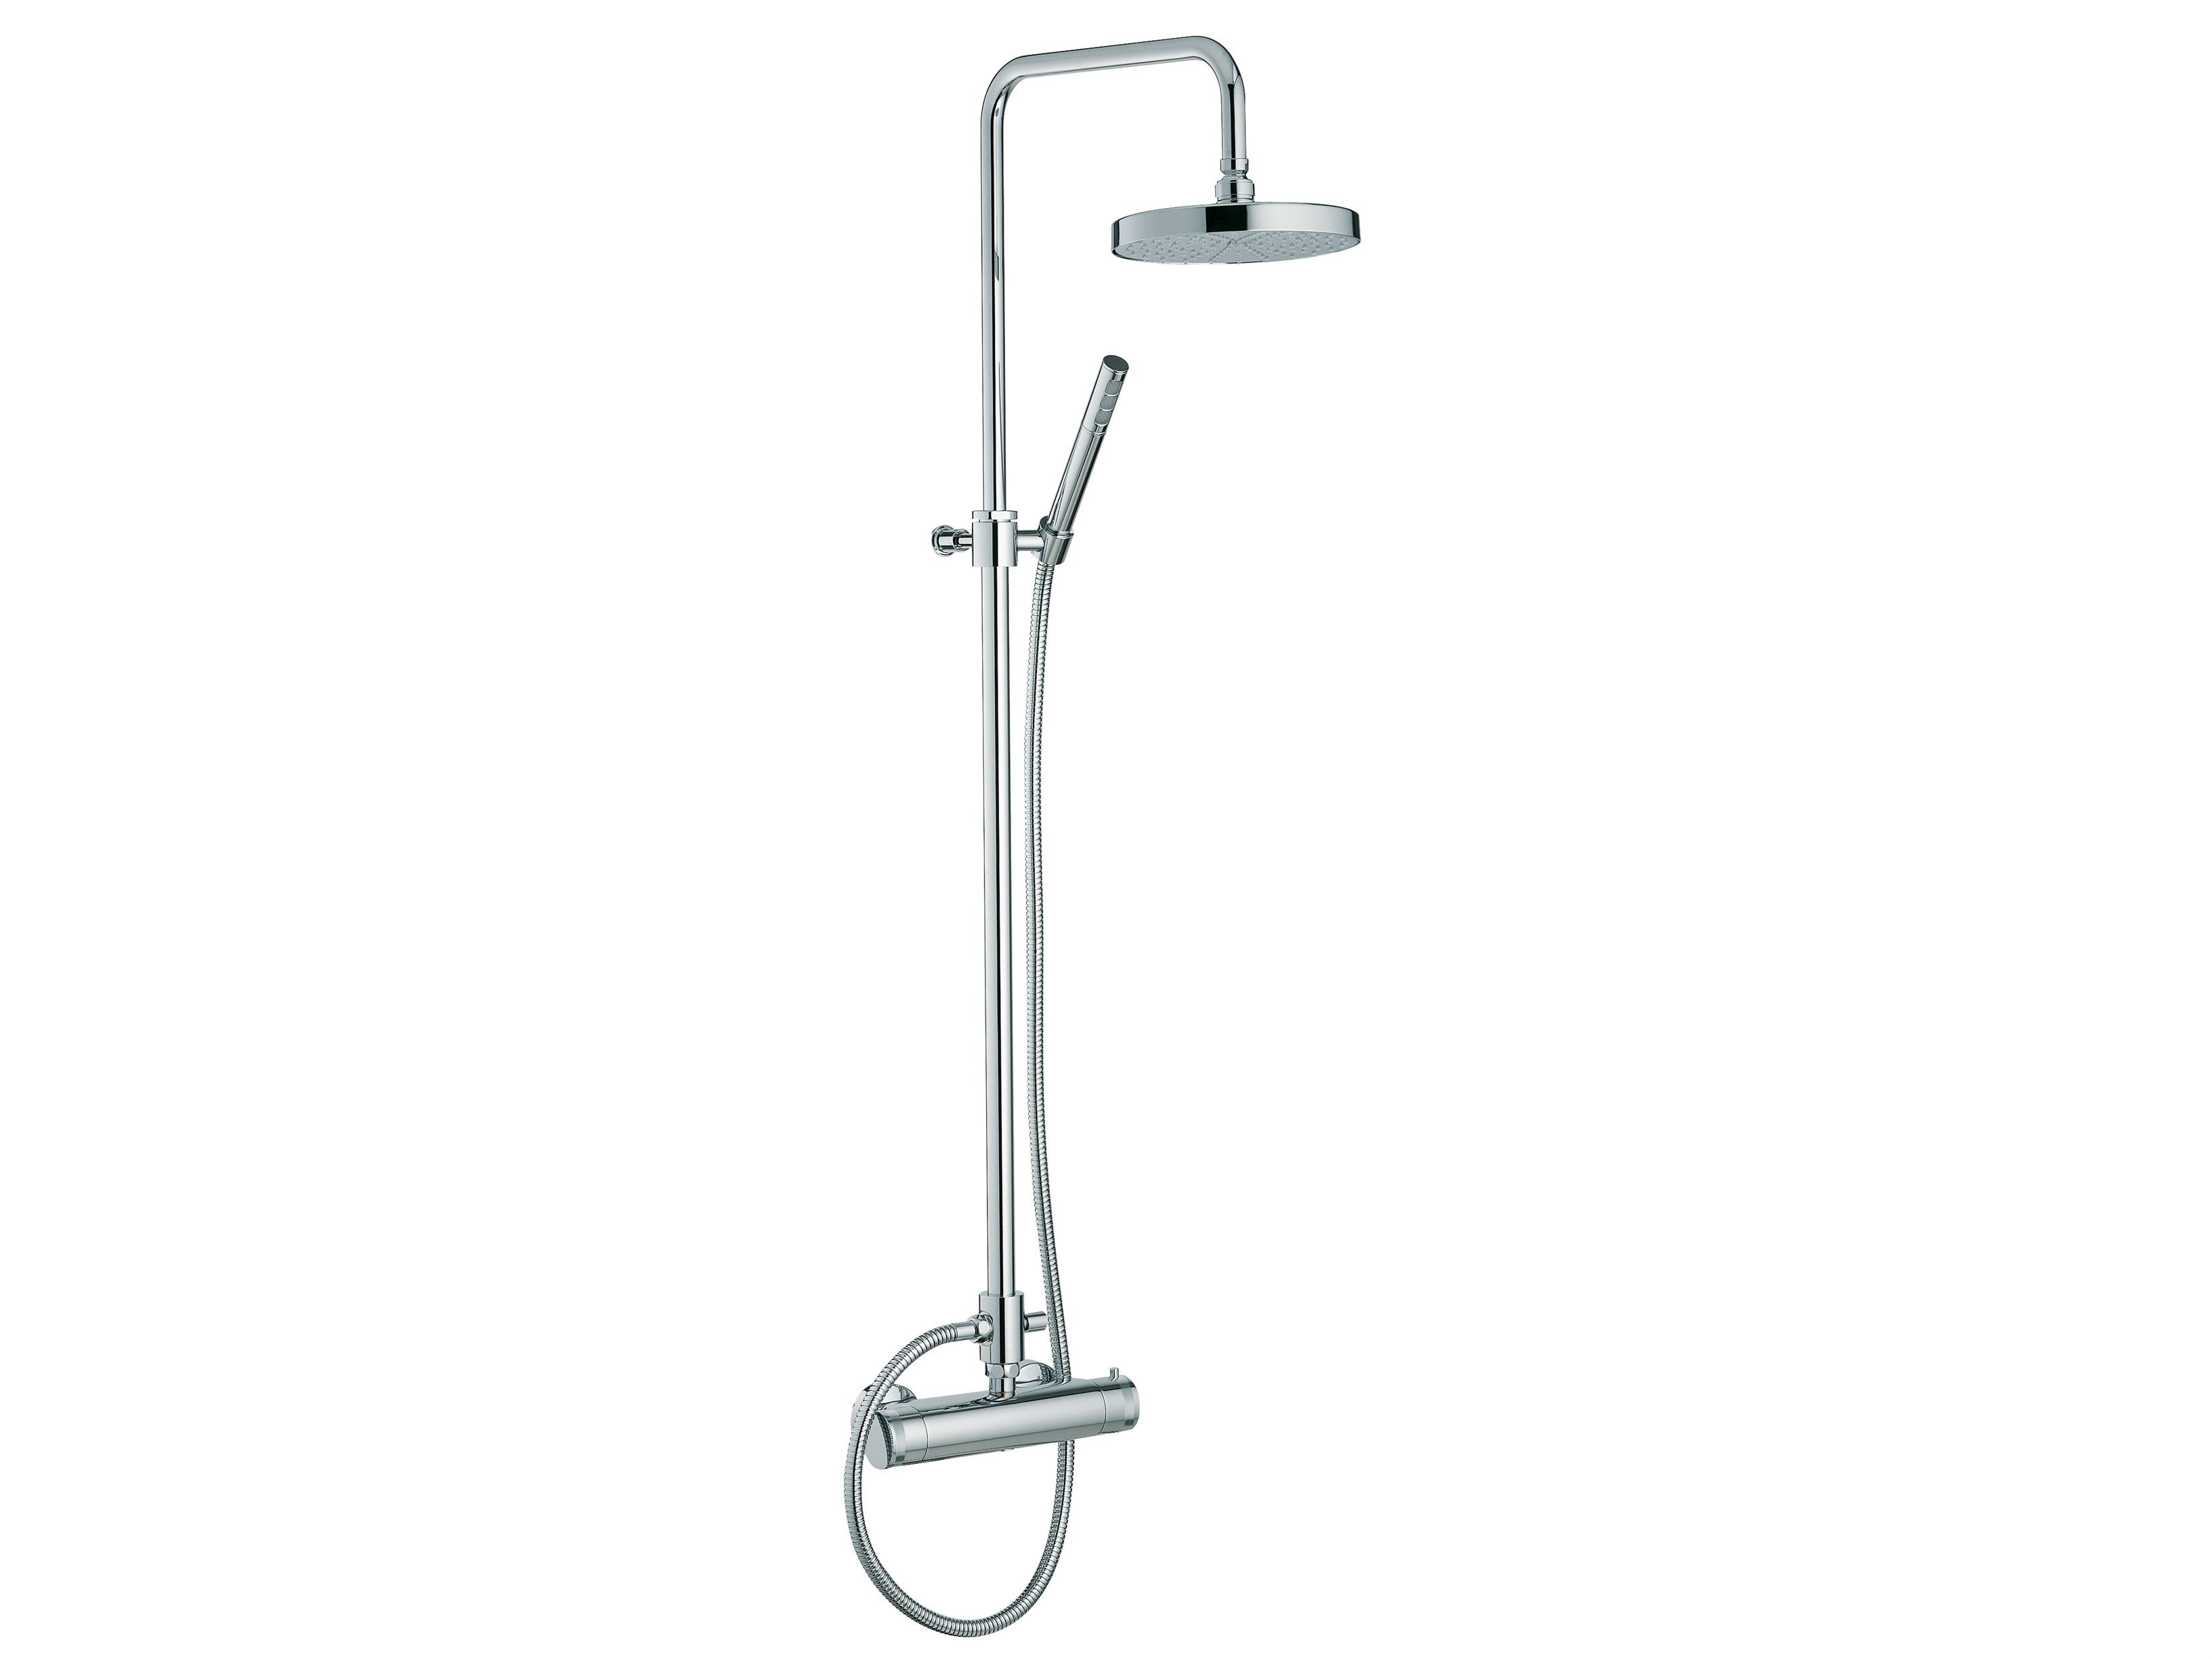 X change mezclador termost tico de ducha con cabeza de - Grifo termostatico ducha ...